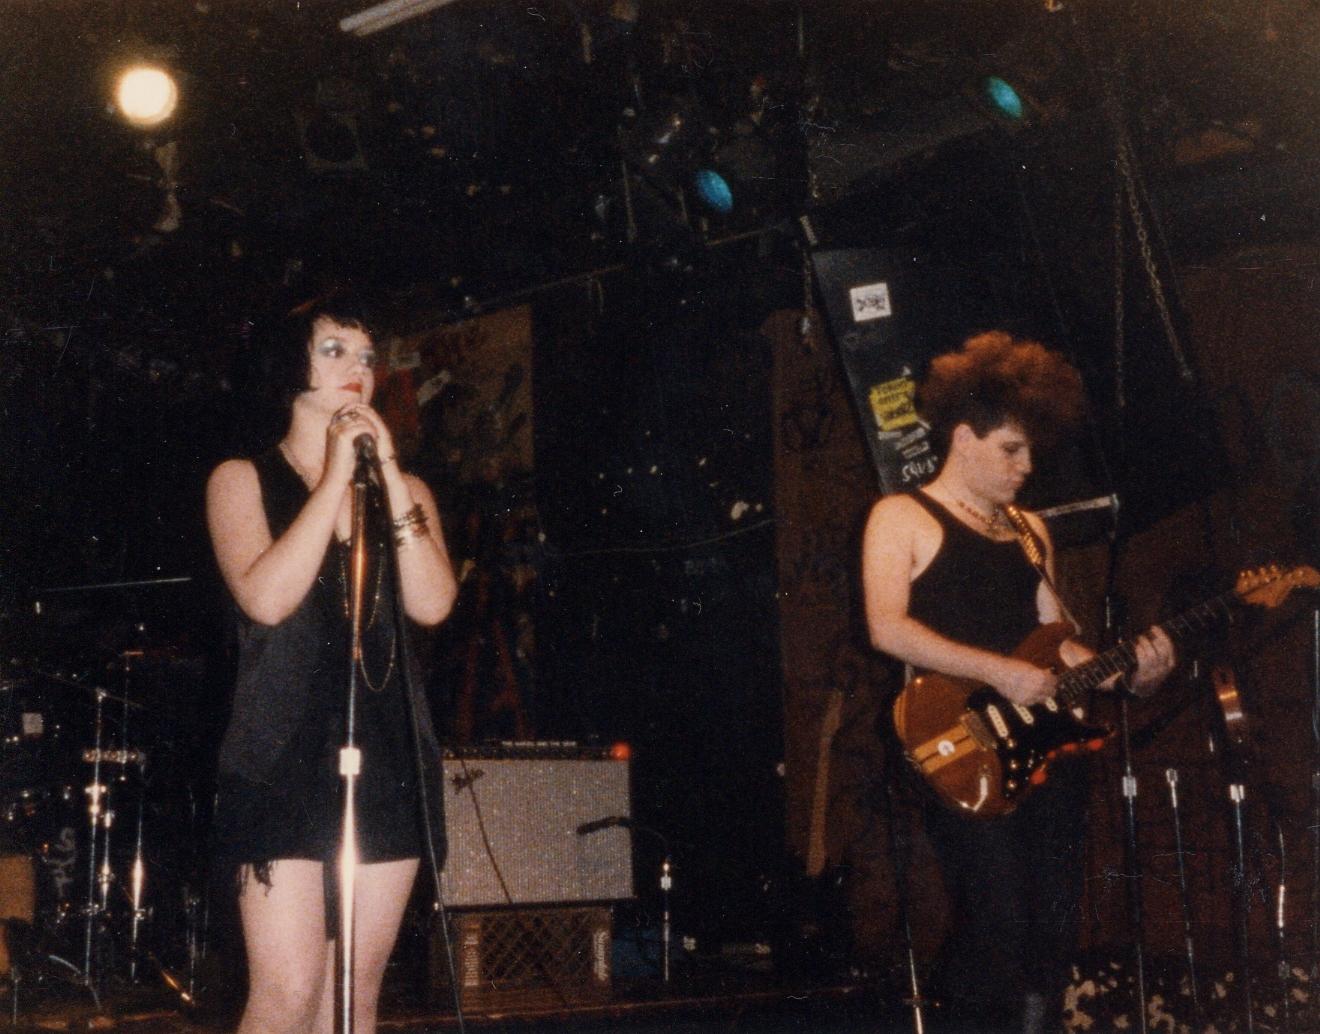 1985-08-12 (16)